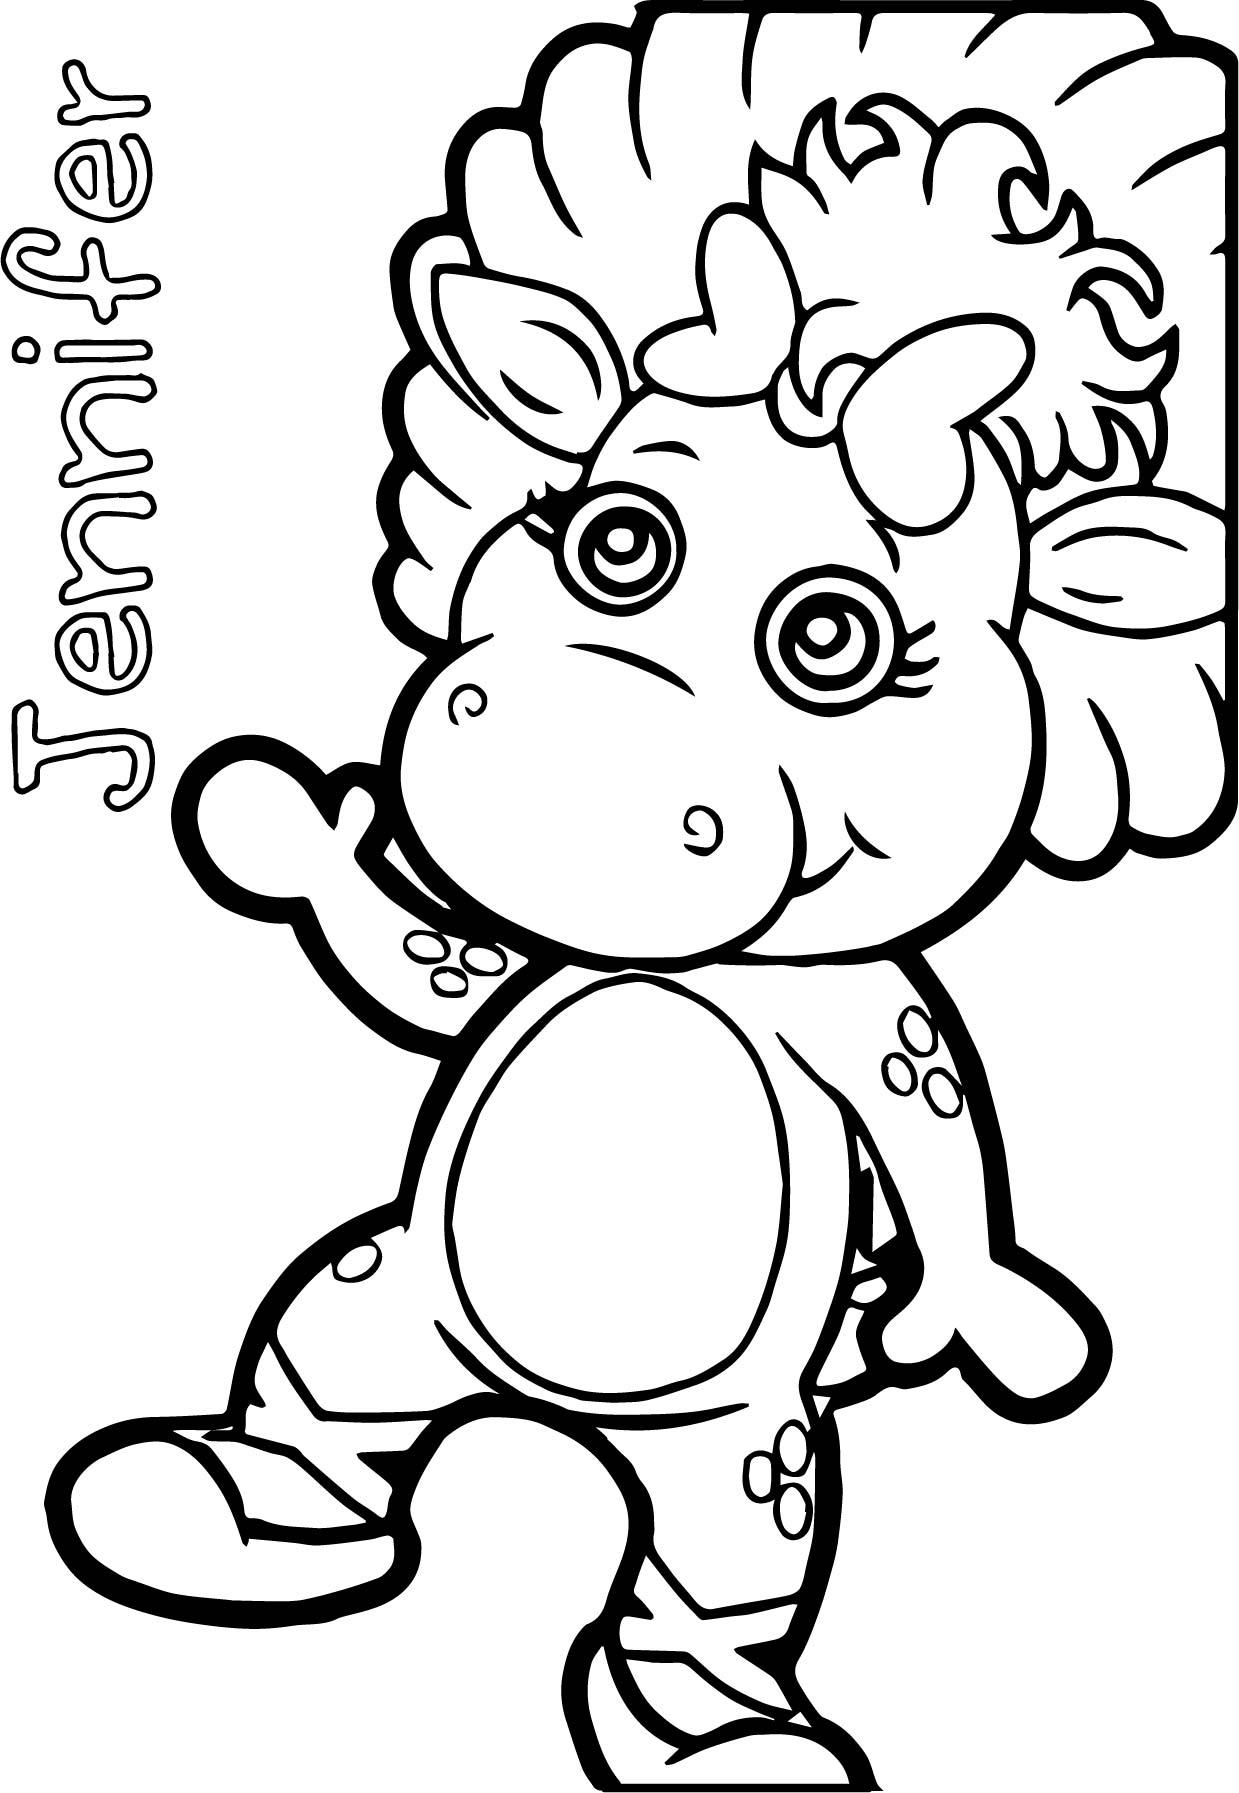 Jennifer Baby Bop Coloring Page